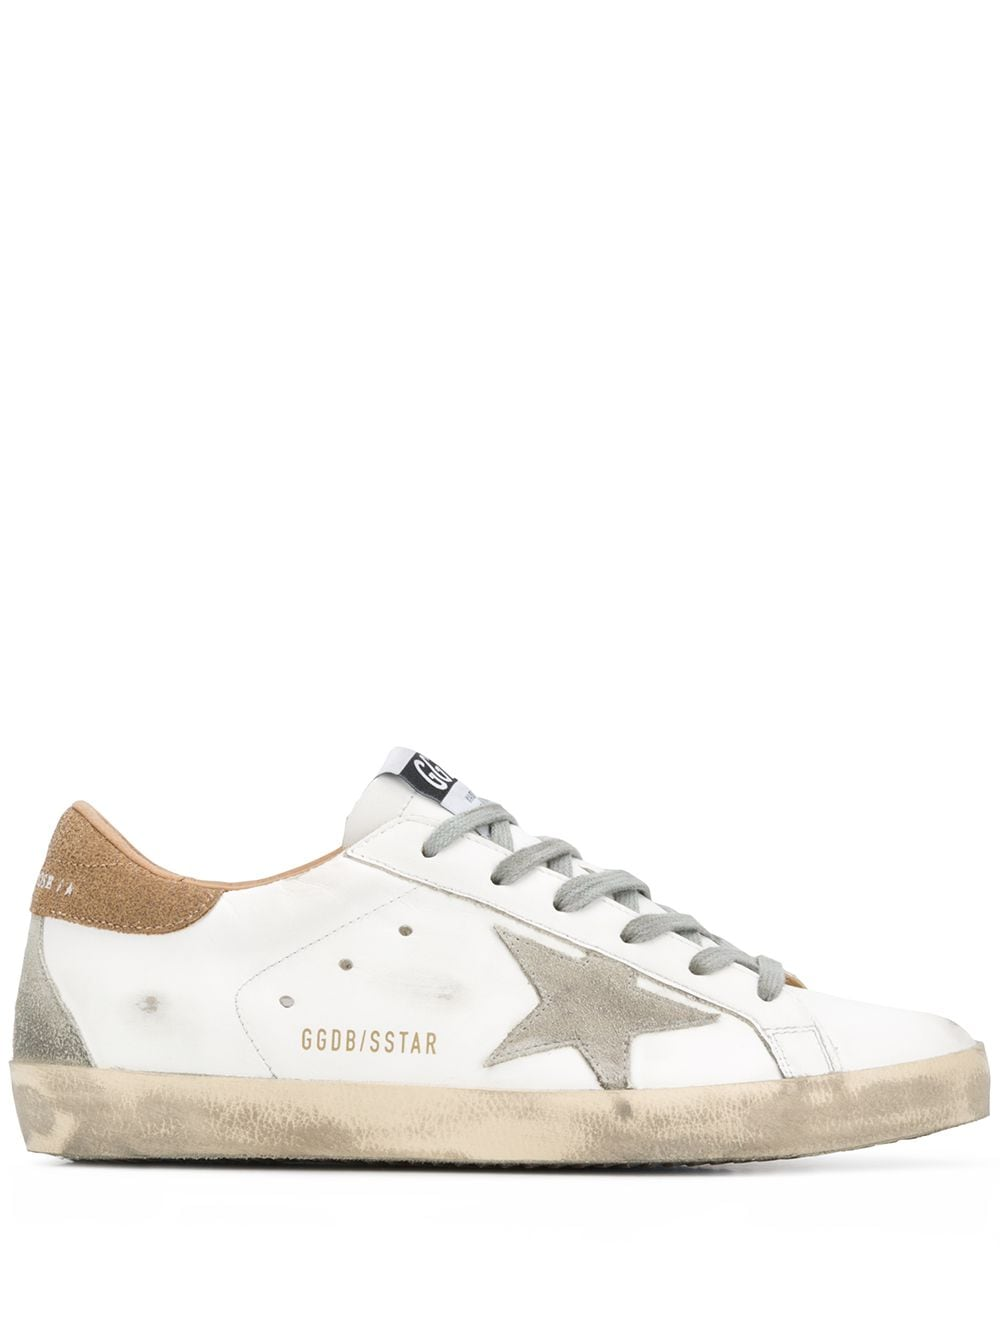 Super Star Woman Sneakers White-Beige